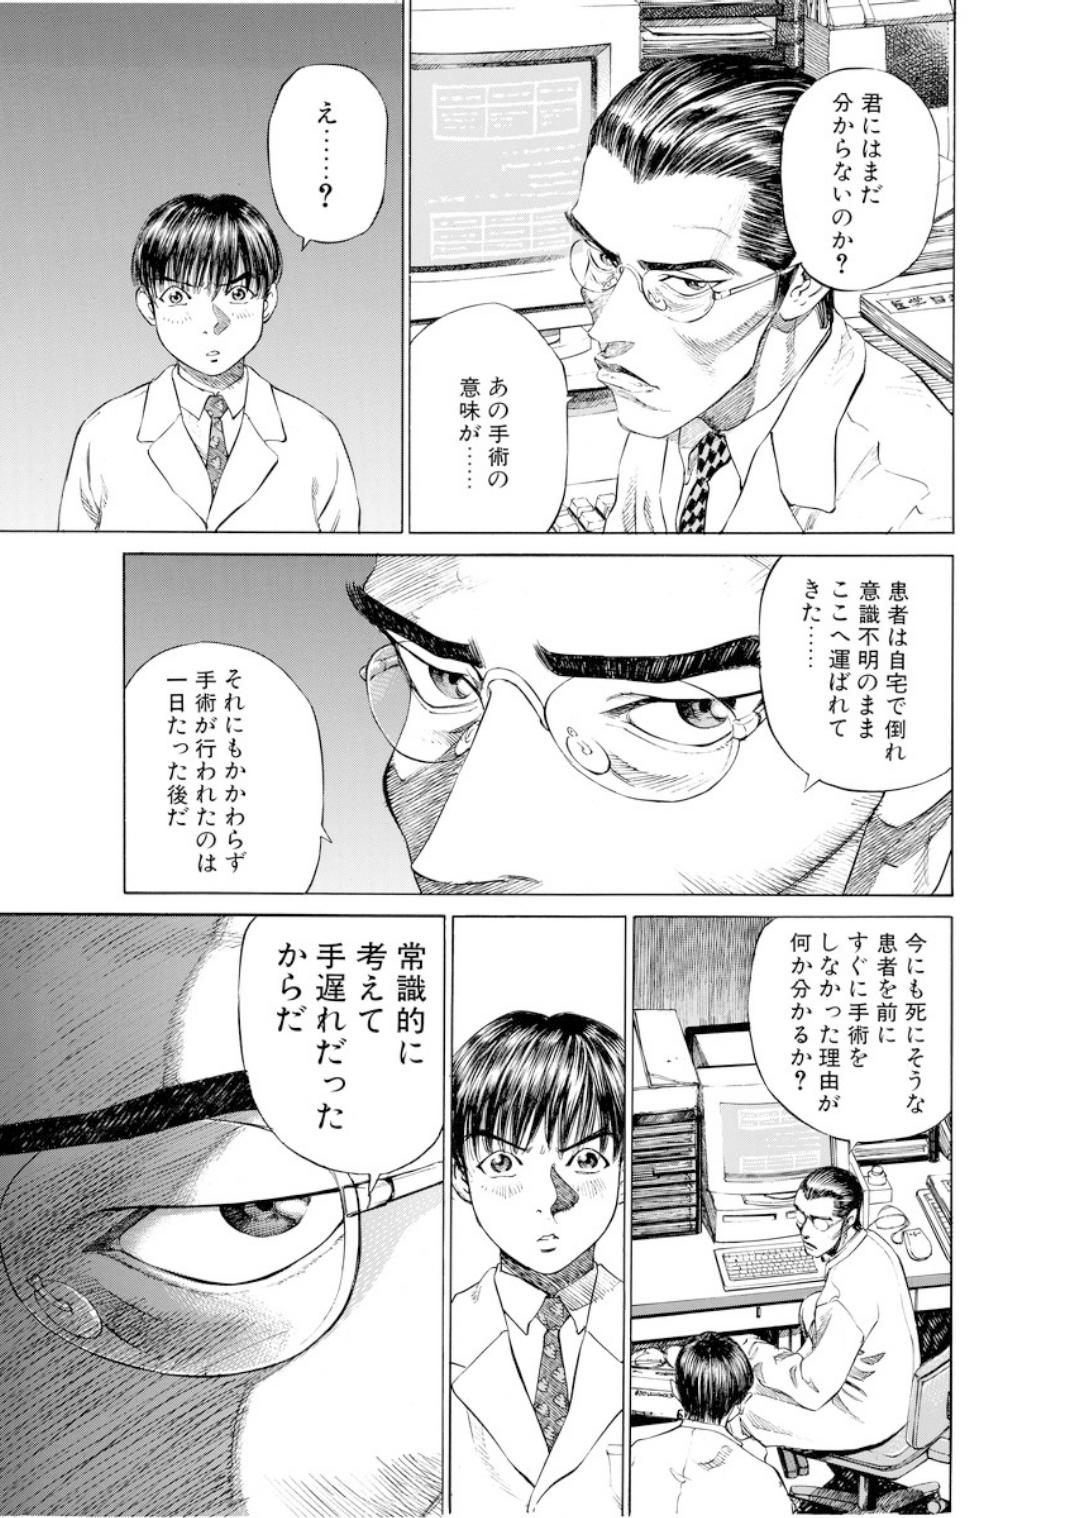 001bj_page-0099.jpg